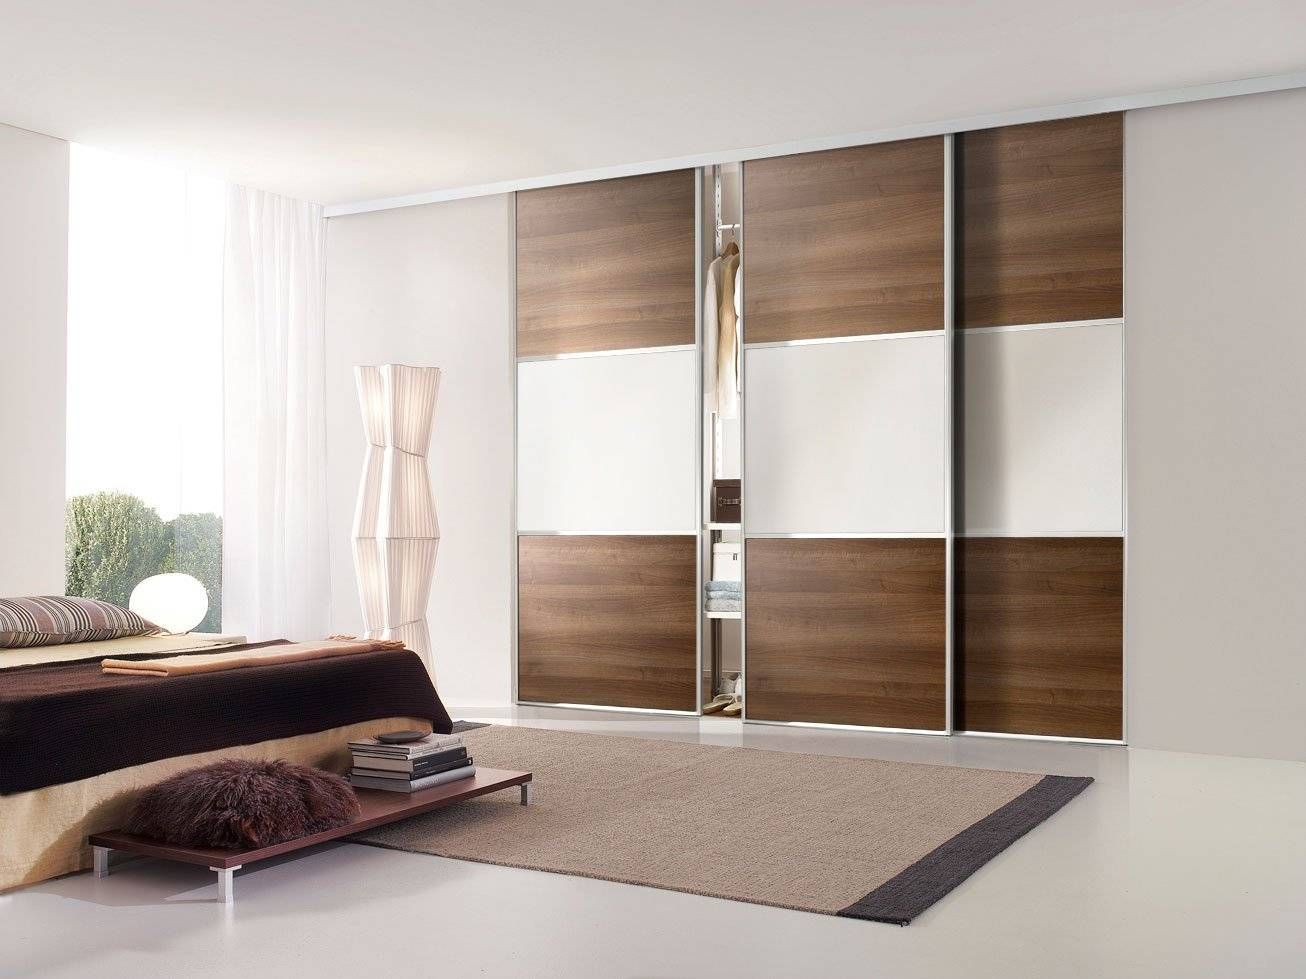 White interior sliding barn doors - Ray Dolap Ankara Raydolap Modelleri S 252 Rg 252 L 252 Dolap Giysi Dolab